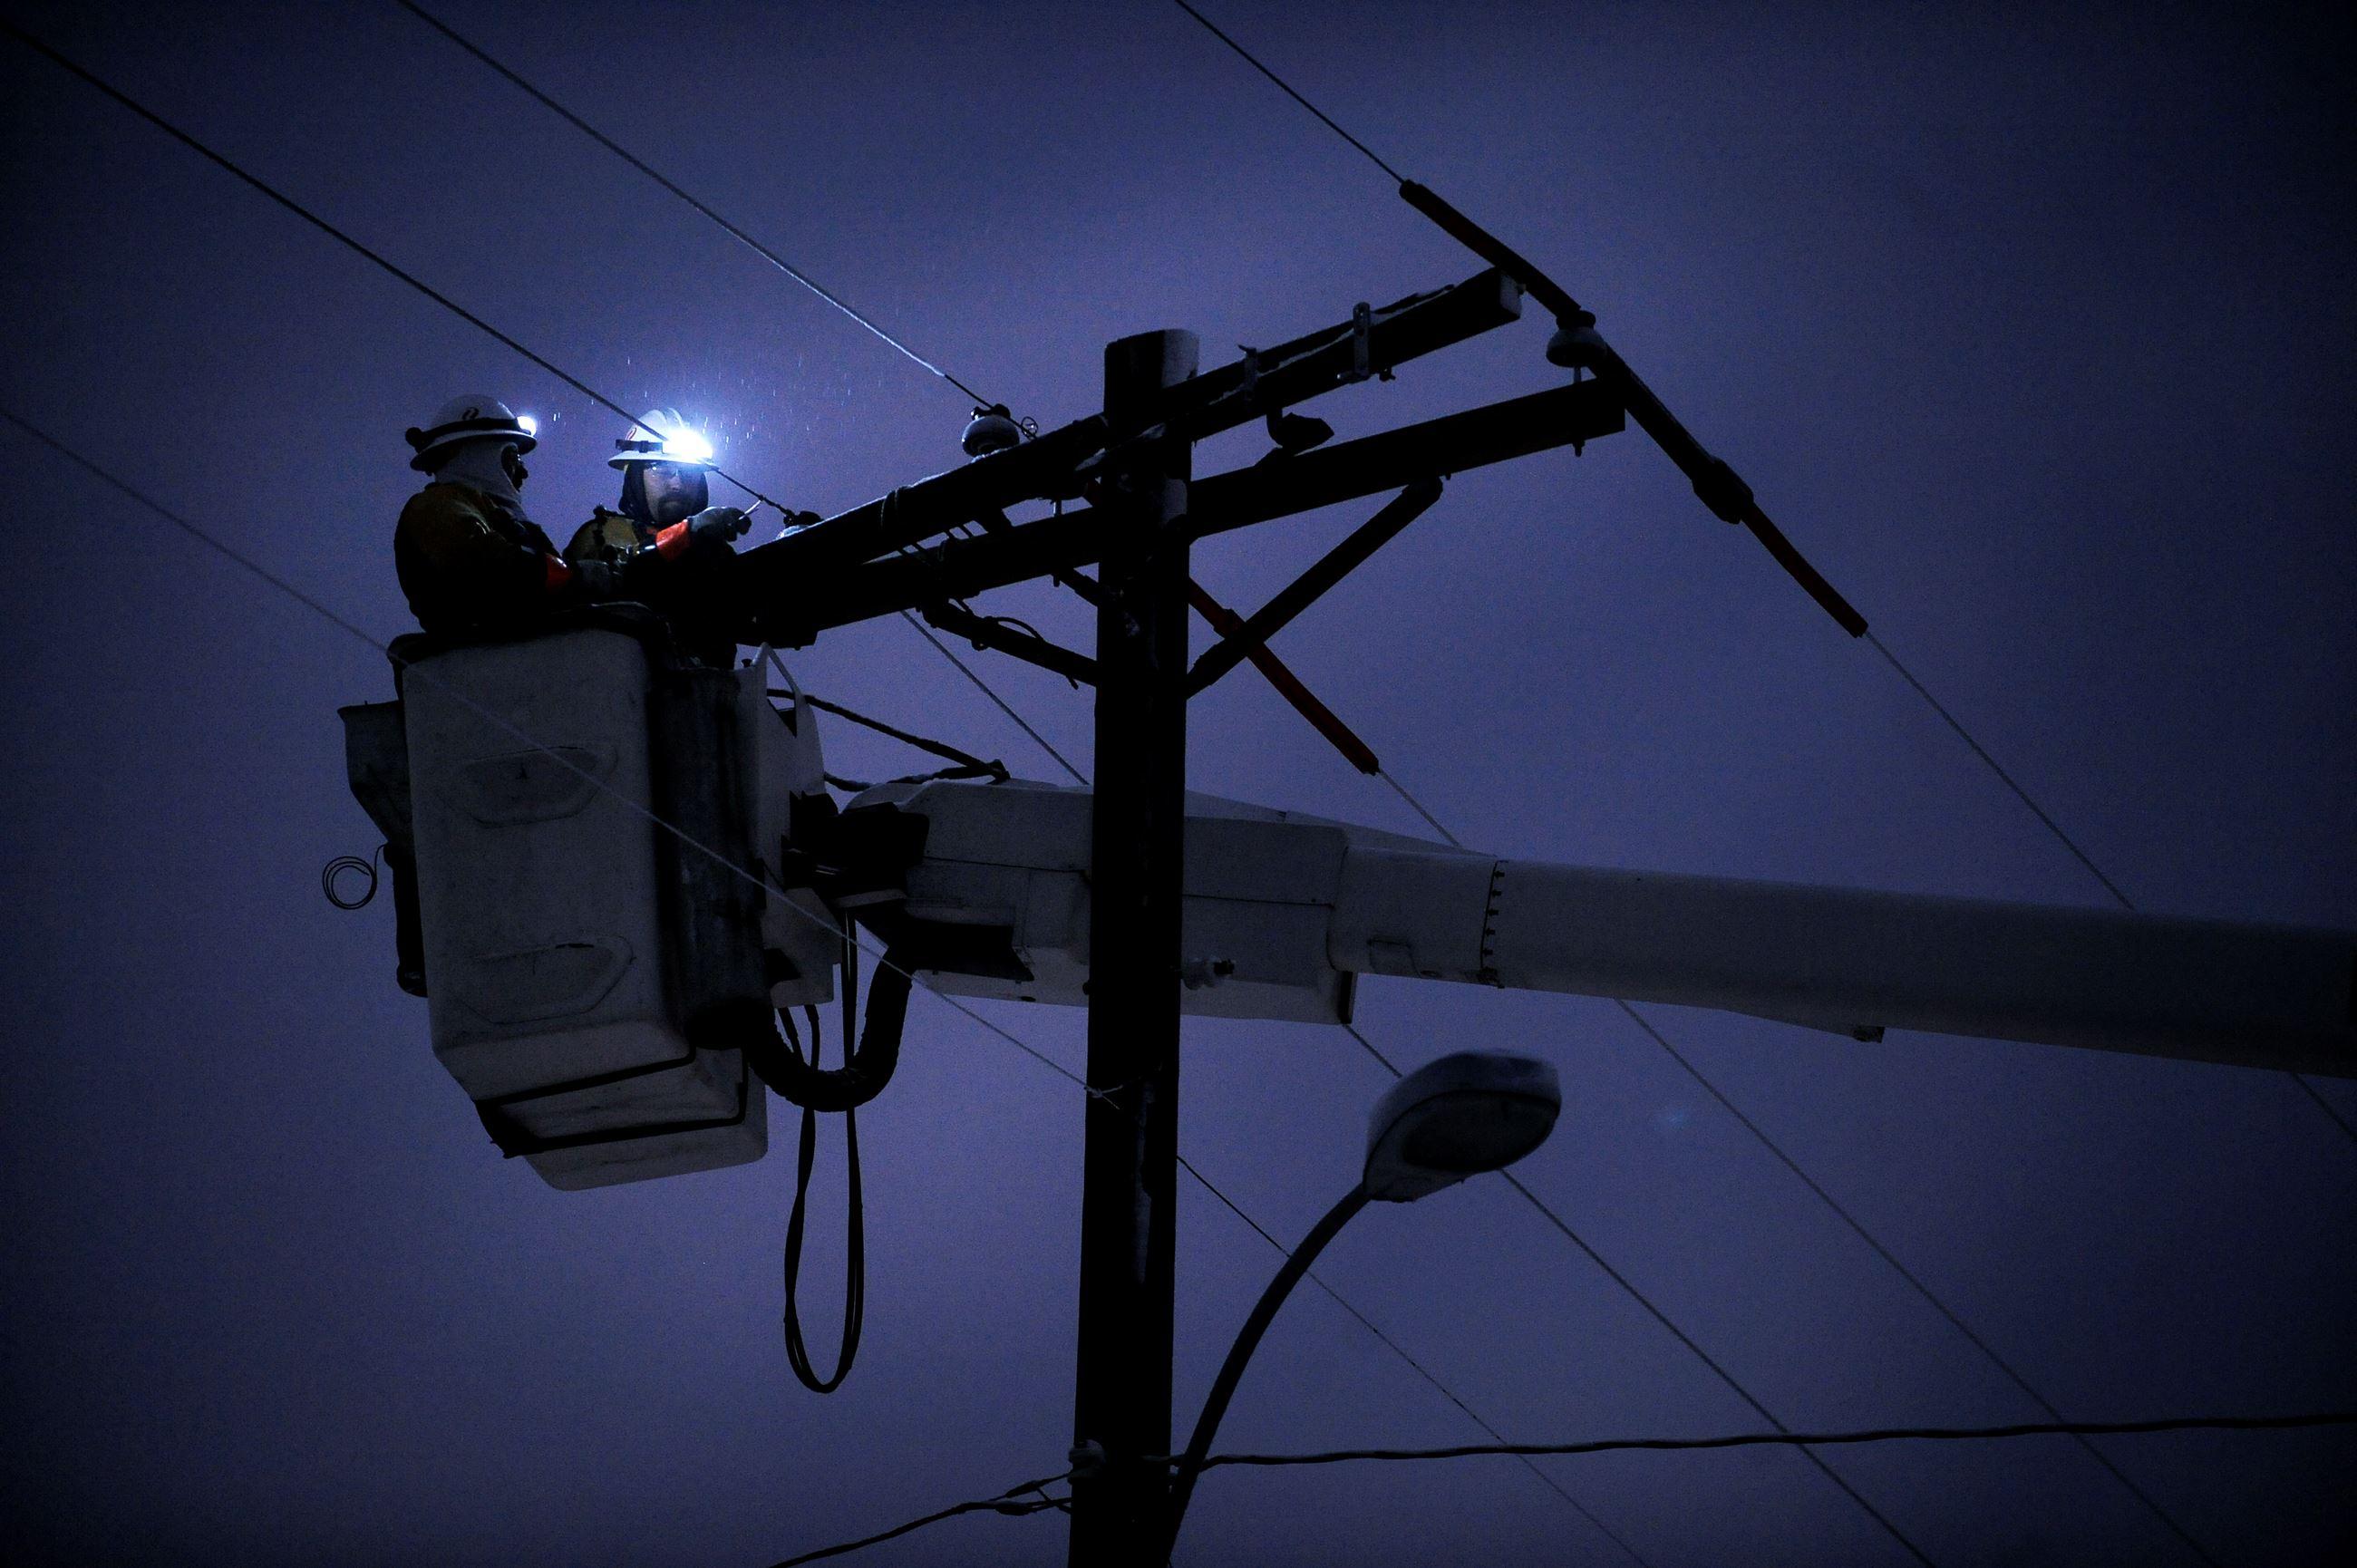 Power Outage Trophy Club Tx